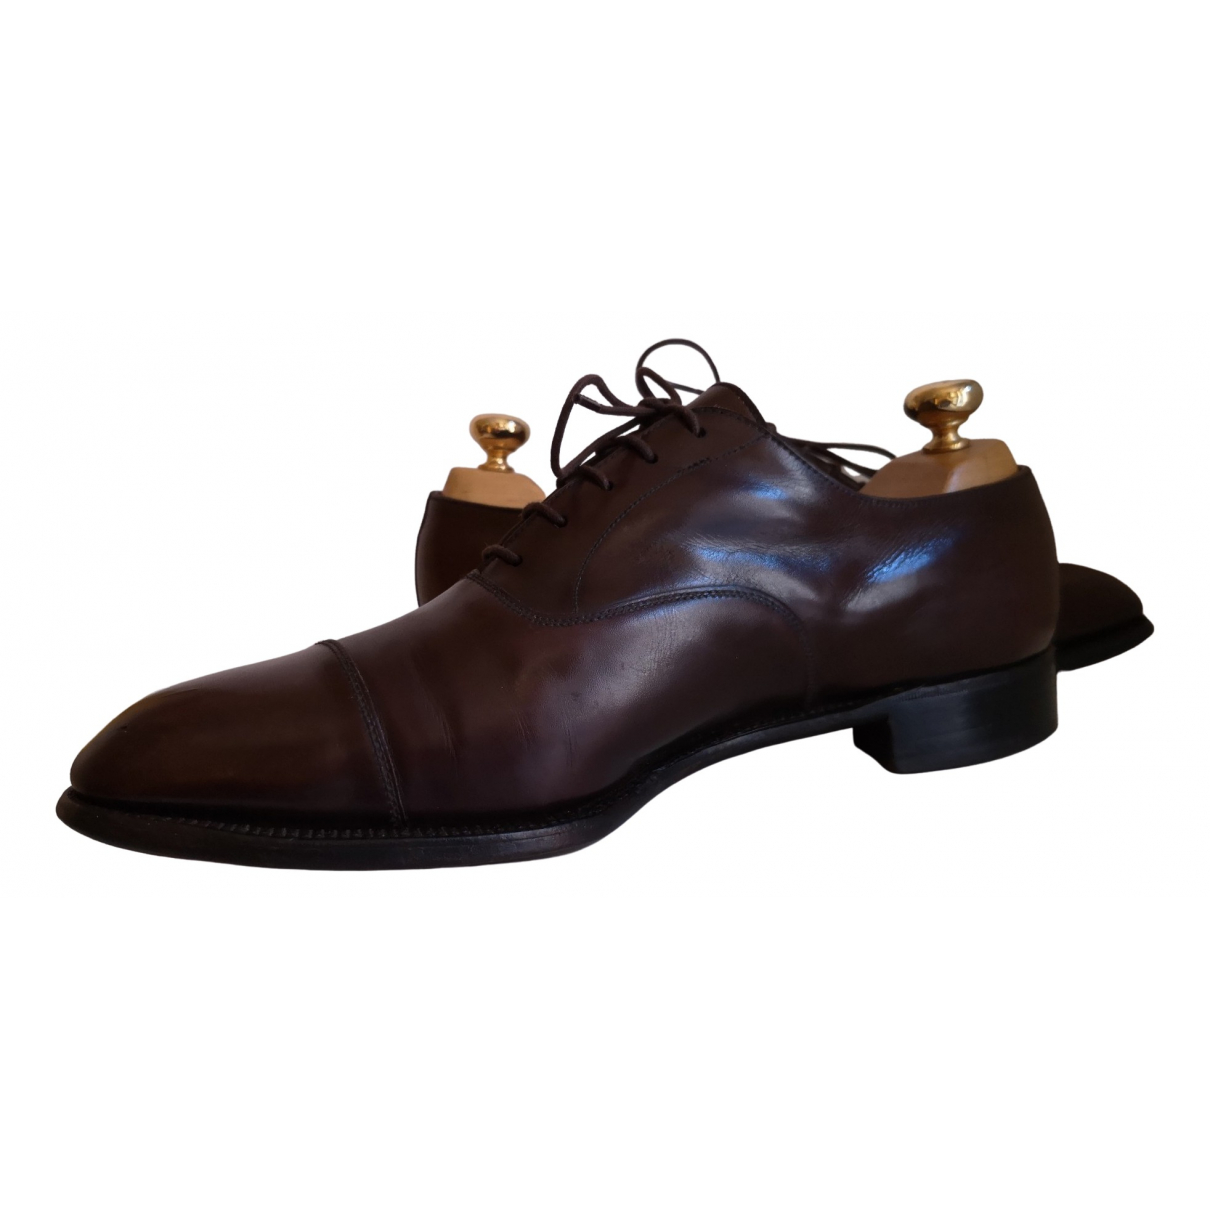 Jm Weston \N Brown Leather Lace ups for Men 42.5 EU